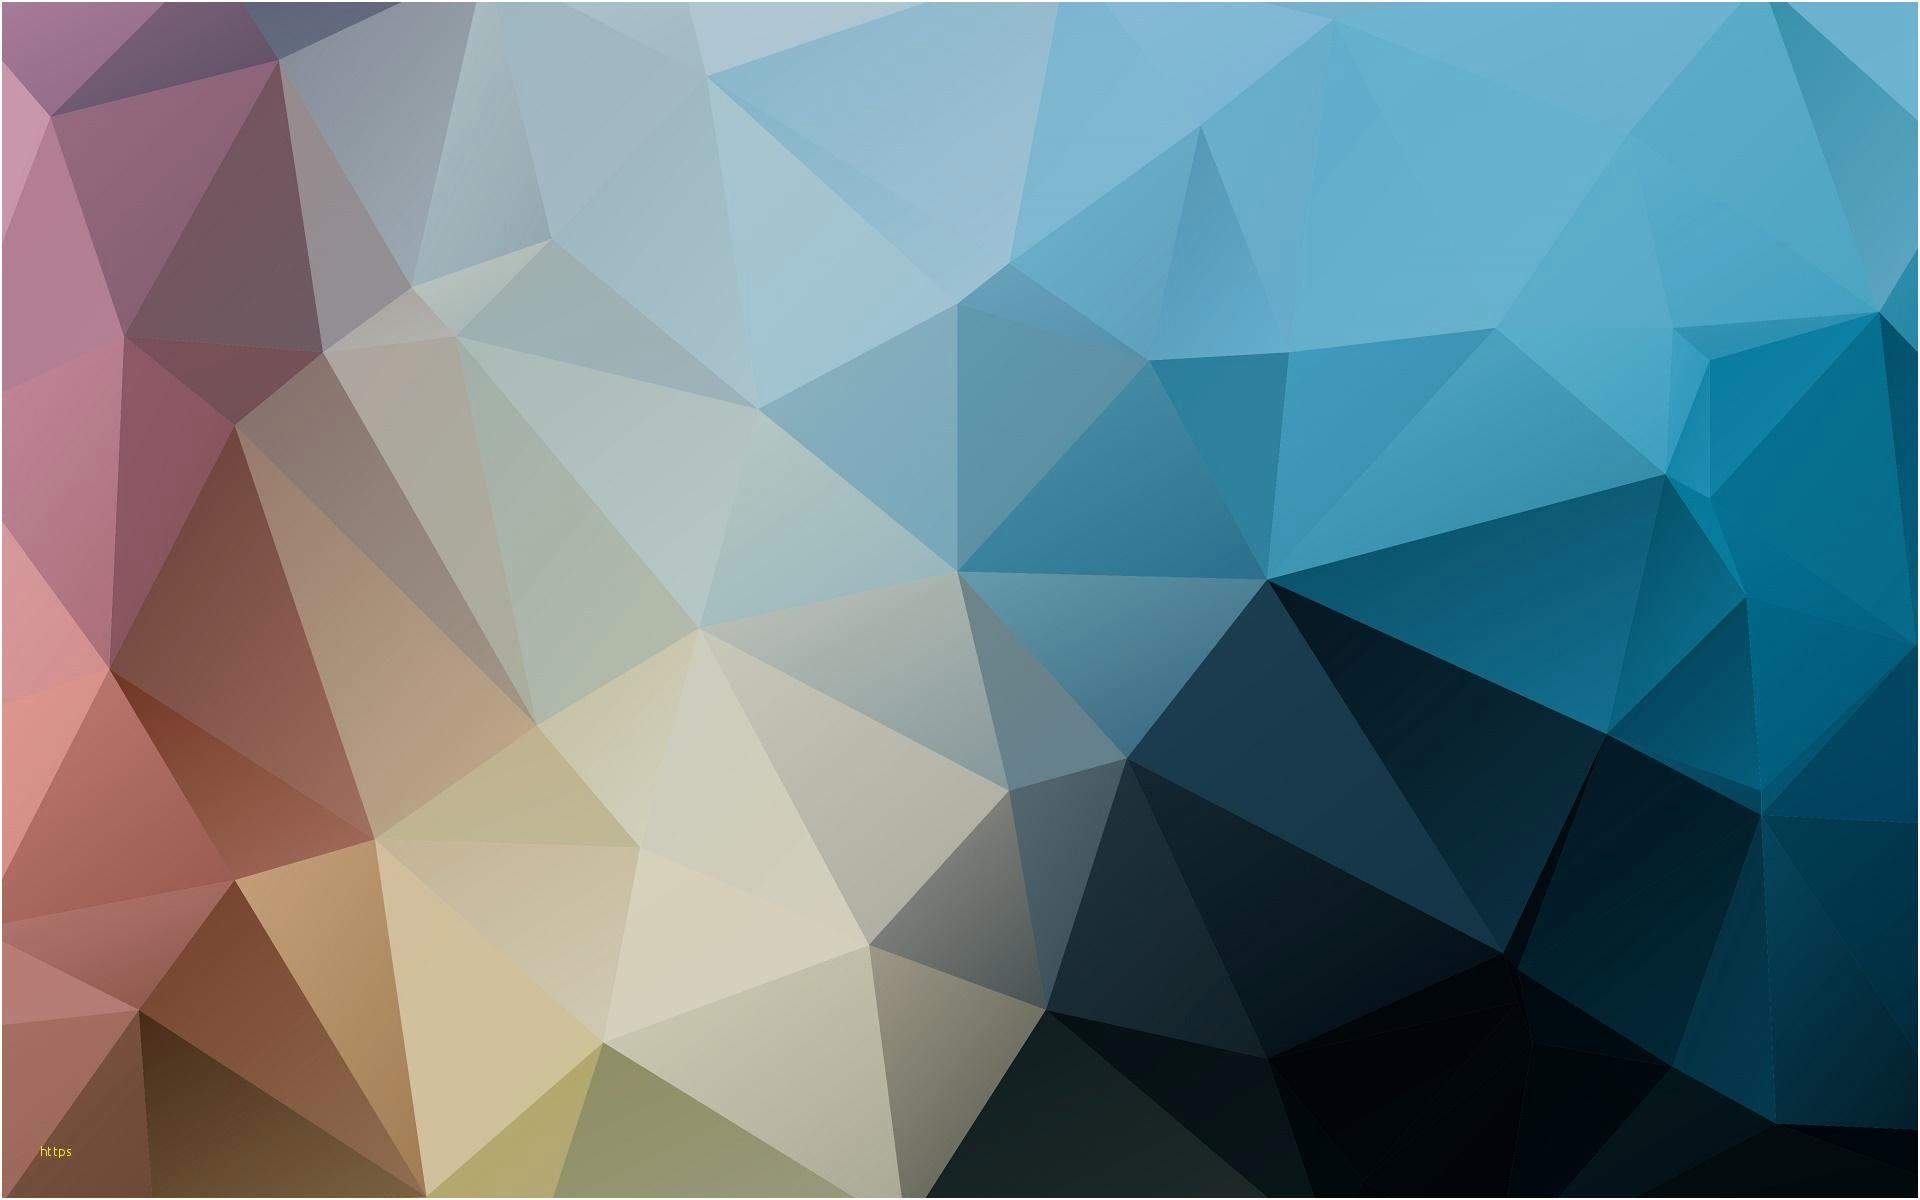 Geometric Wallpaper Fresh Geometry Abstract Wallpaper - High